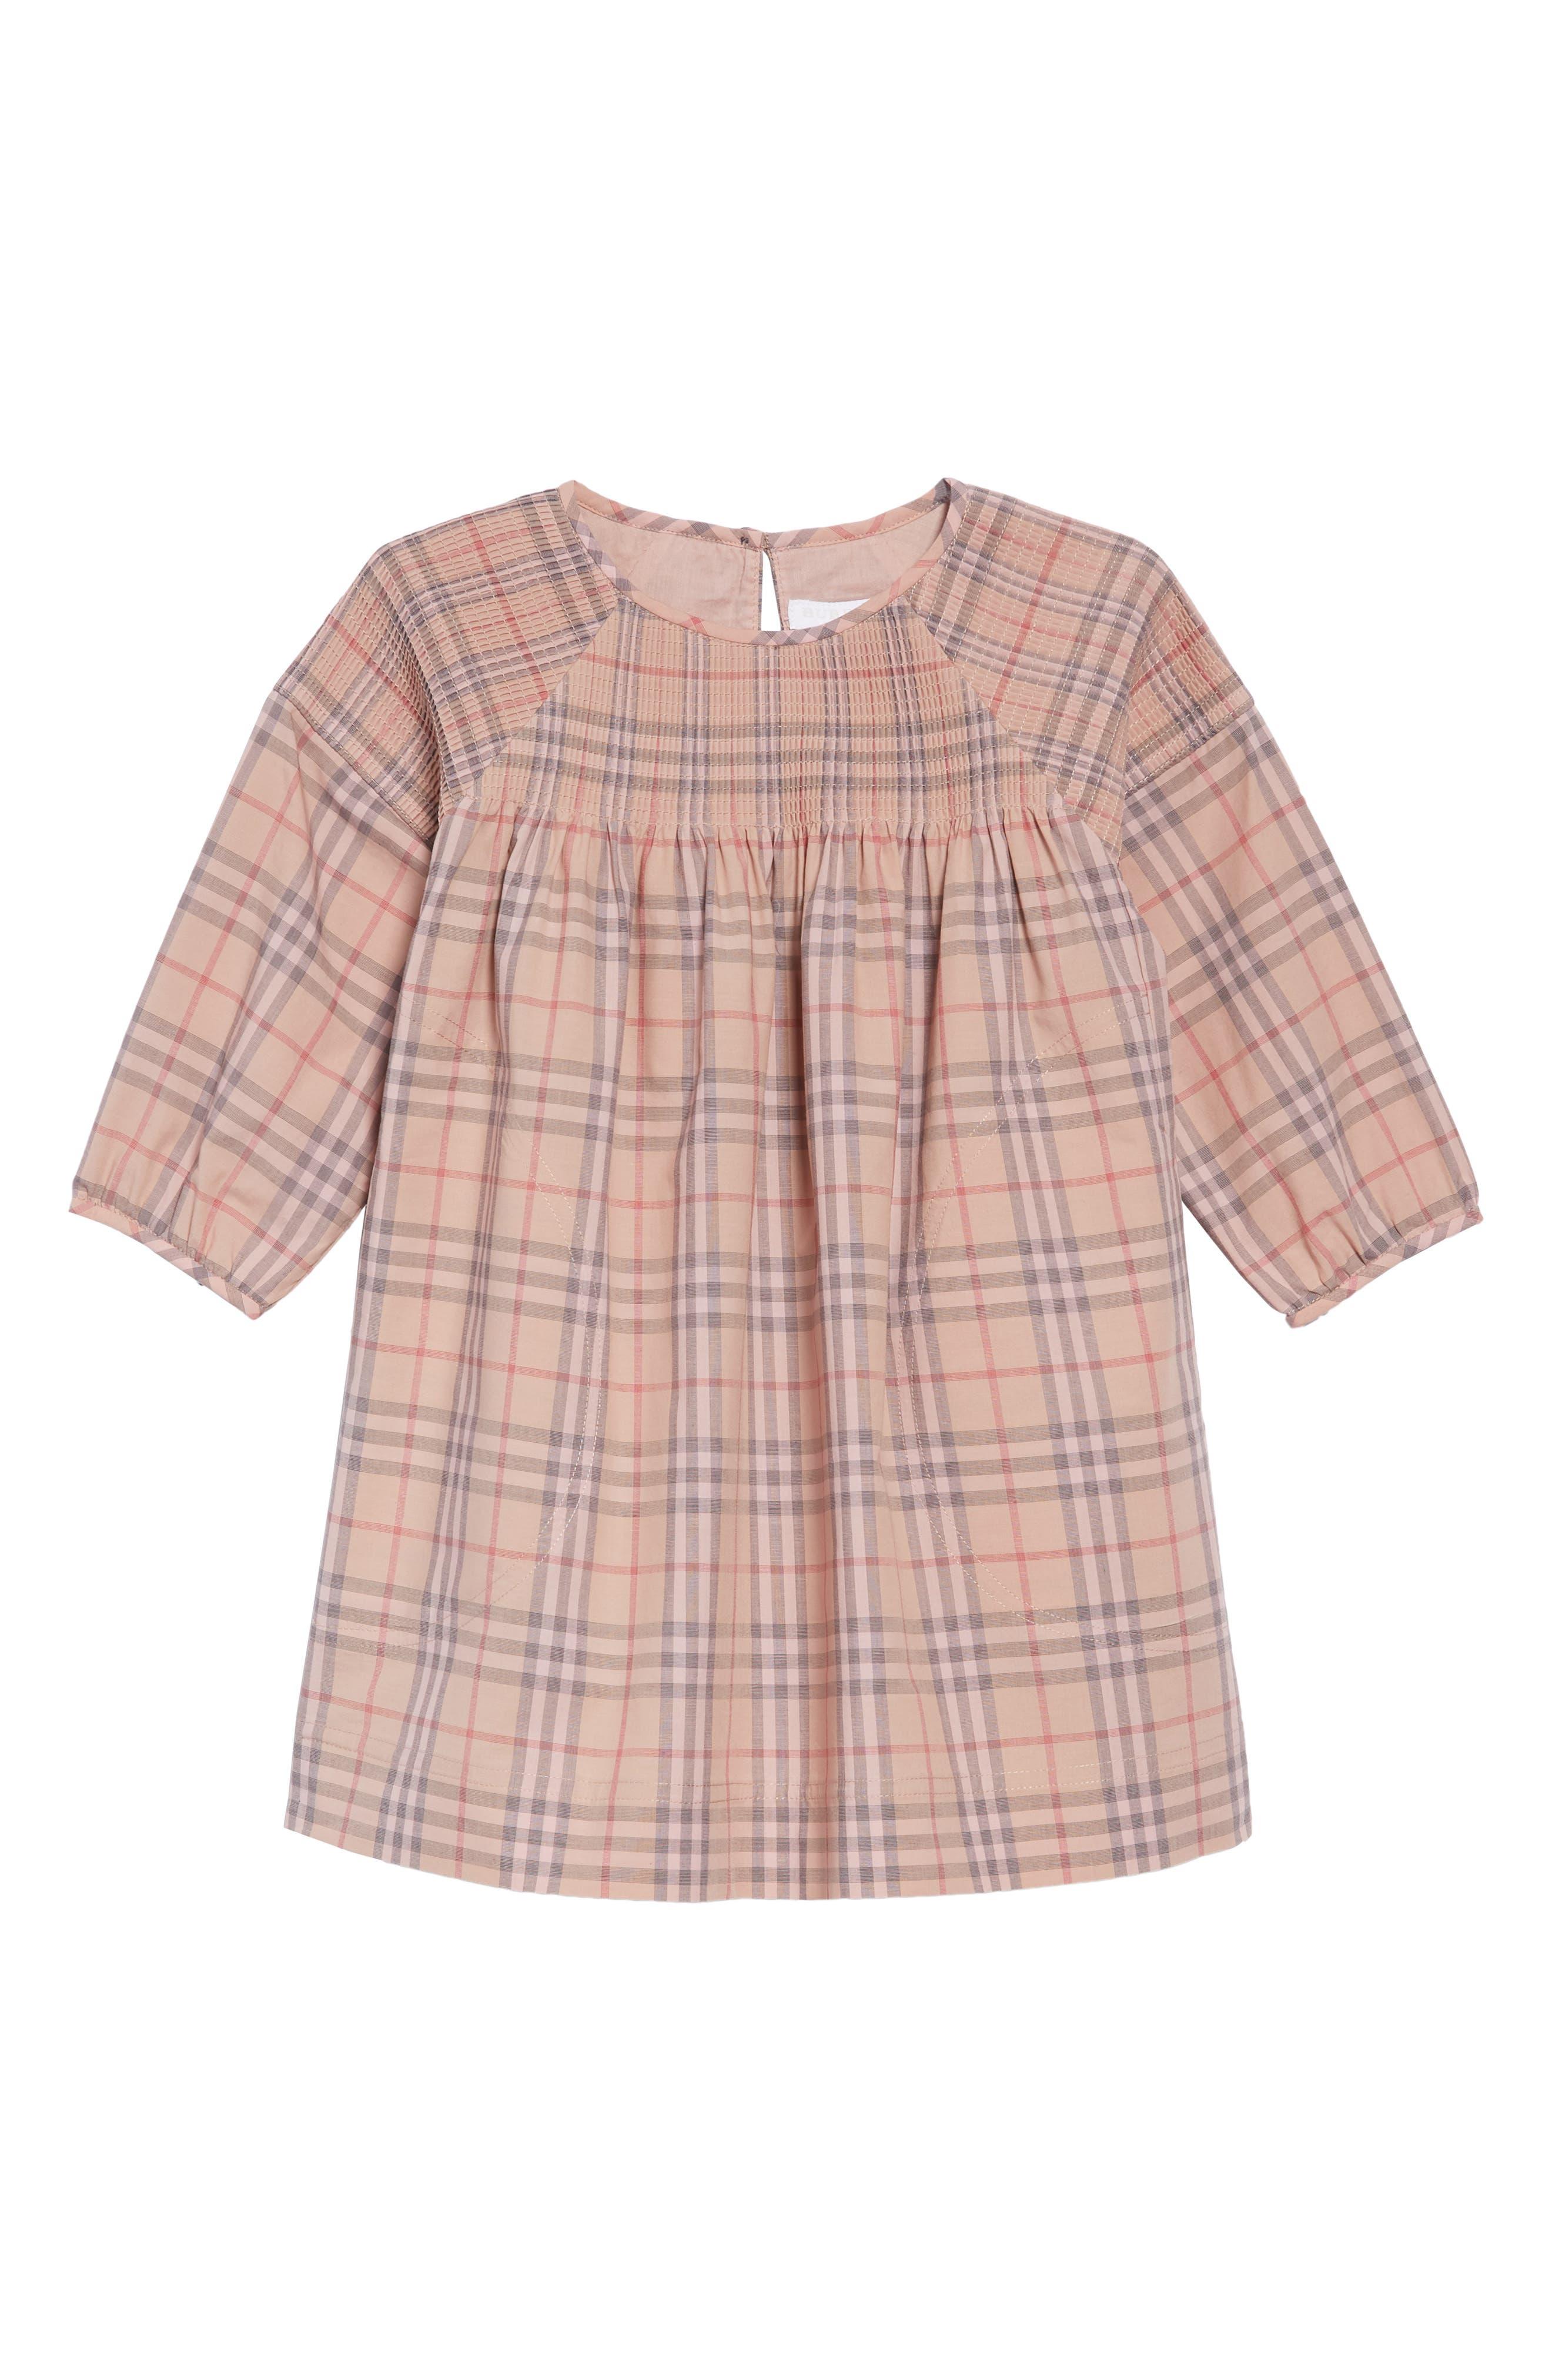 Mini Loralie Ruffle Detail Check Cotton Dress,                         Main,                         color, PALE PINK